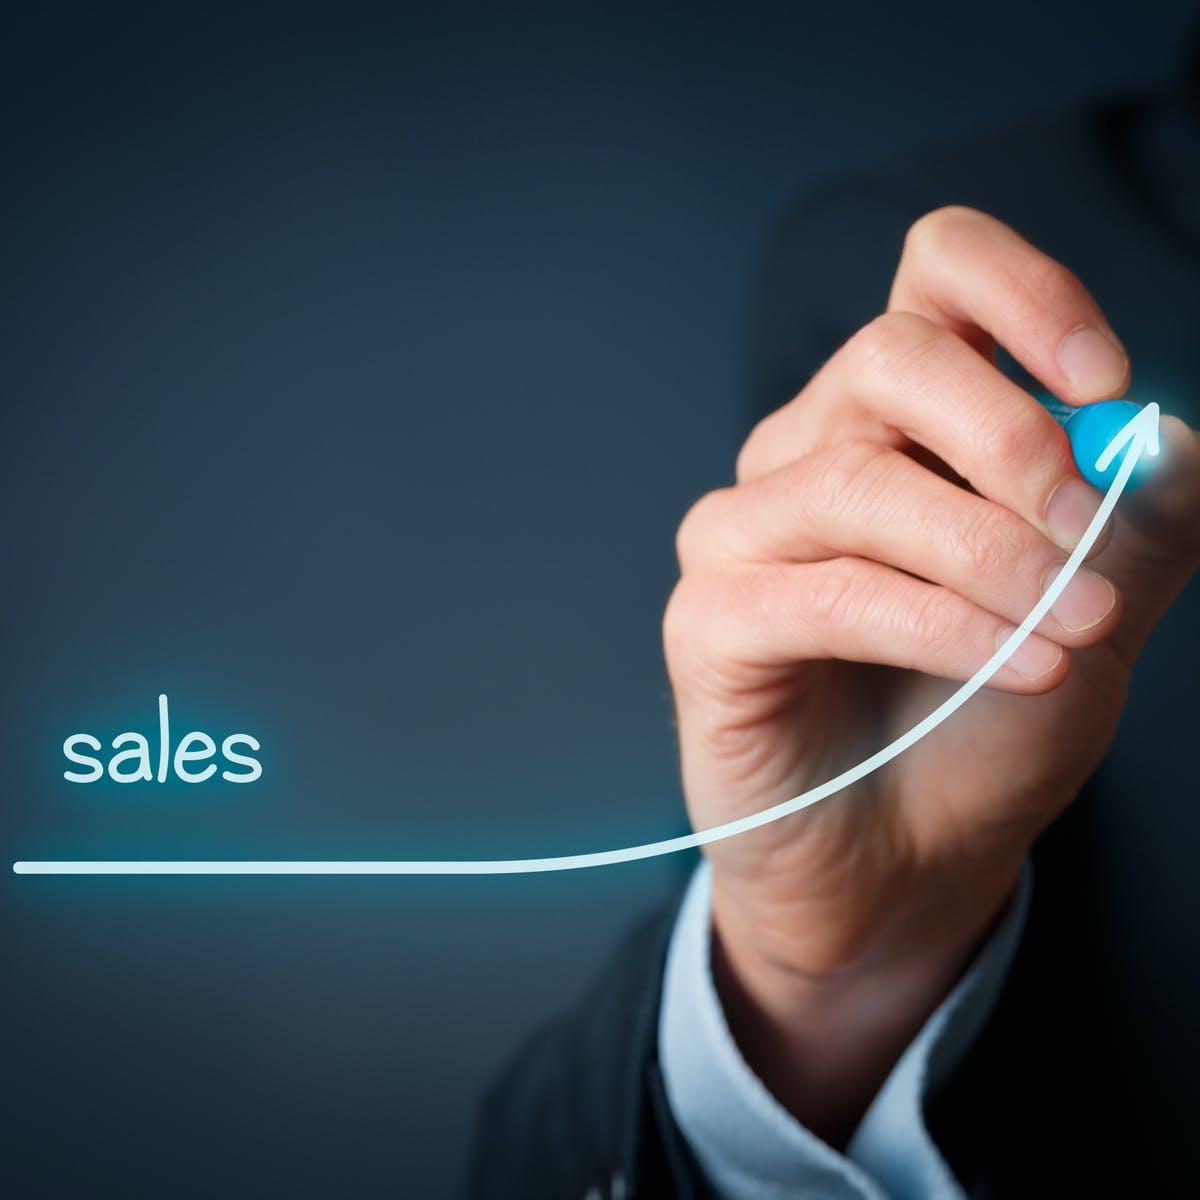 Strategic Sales Management Final Project